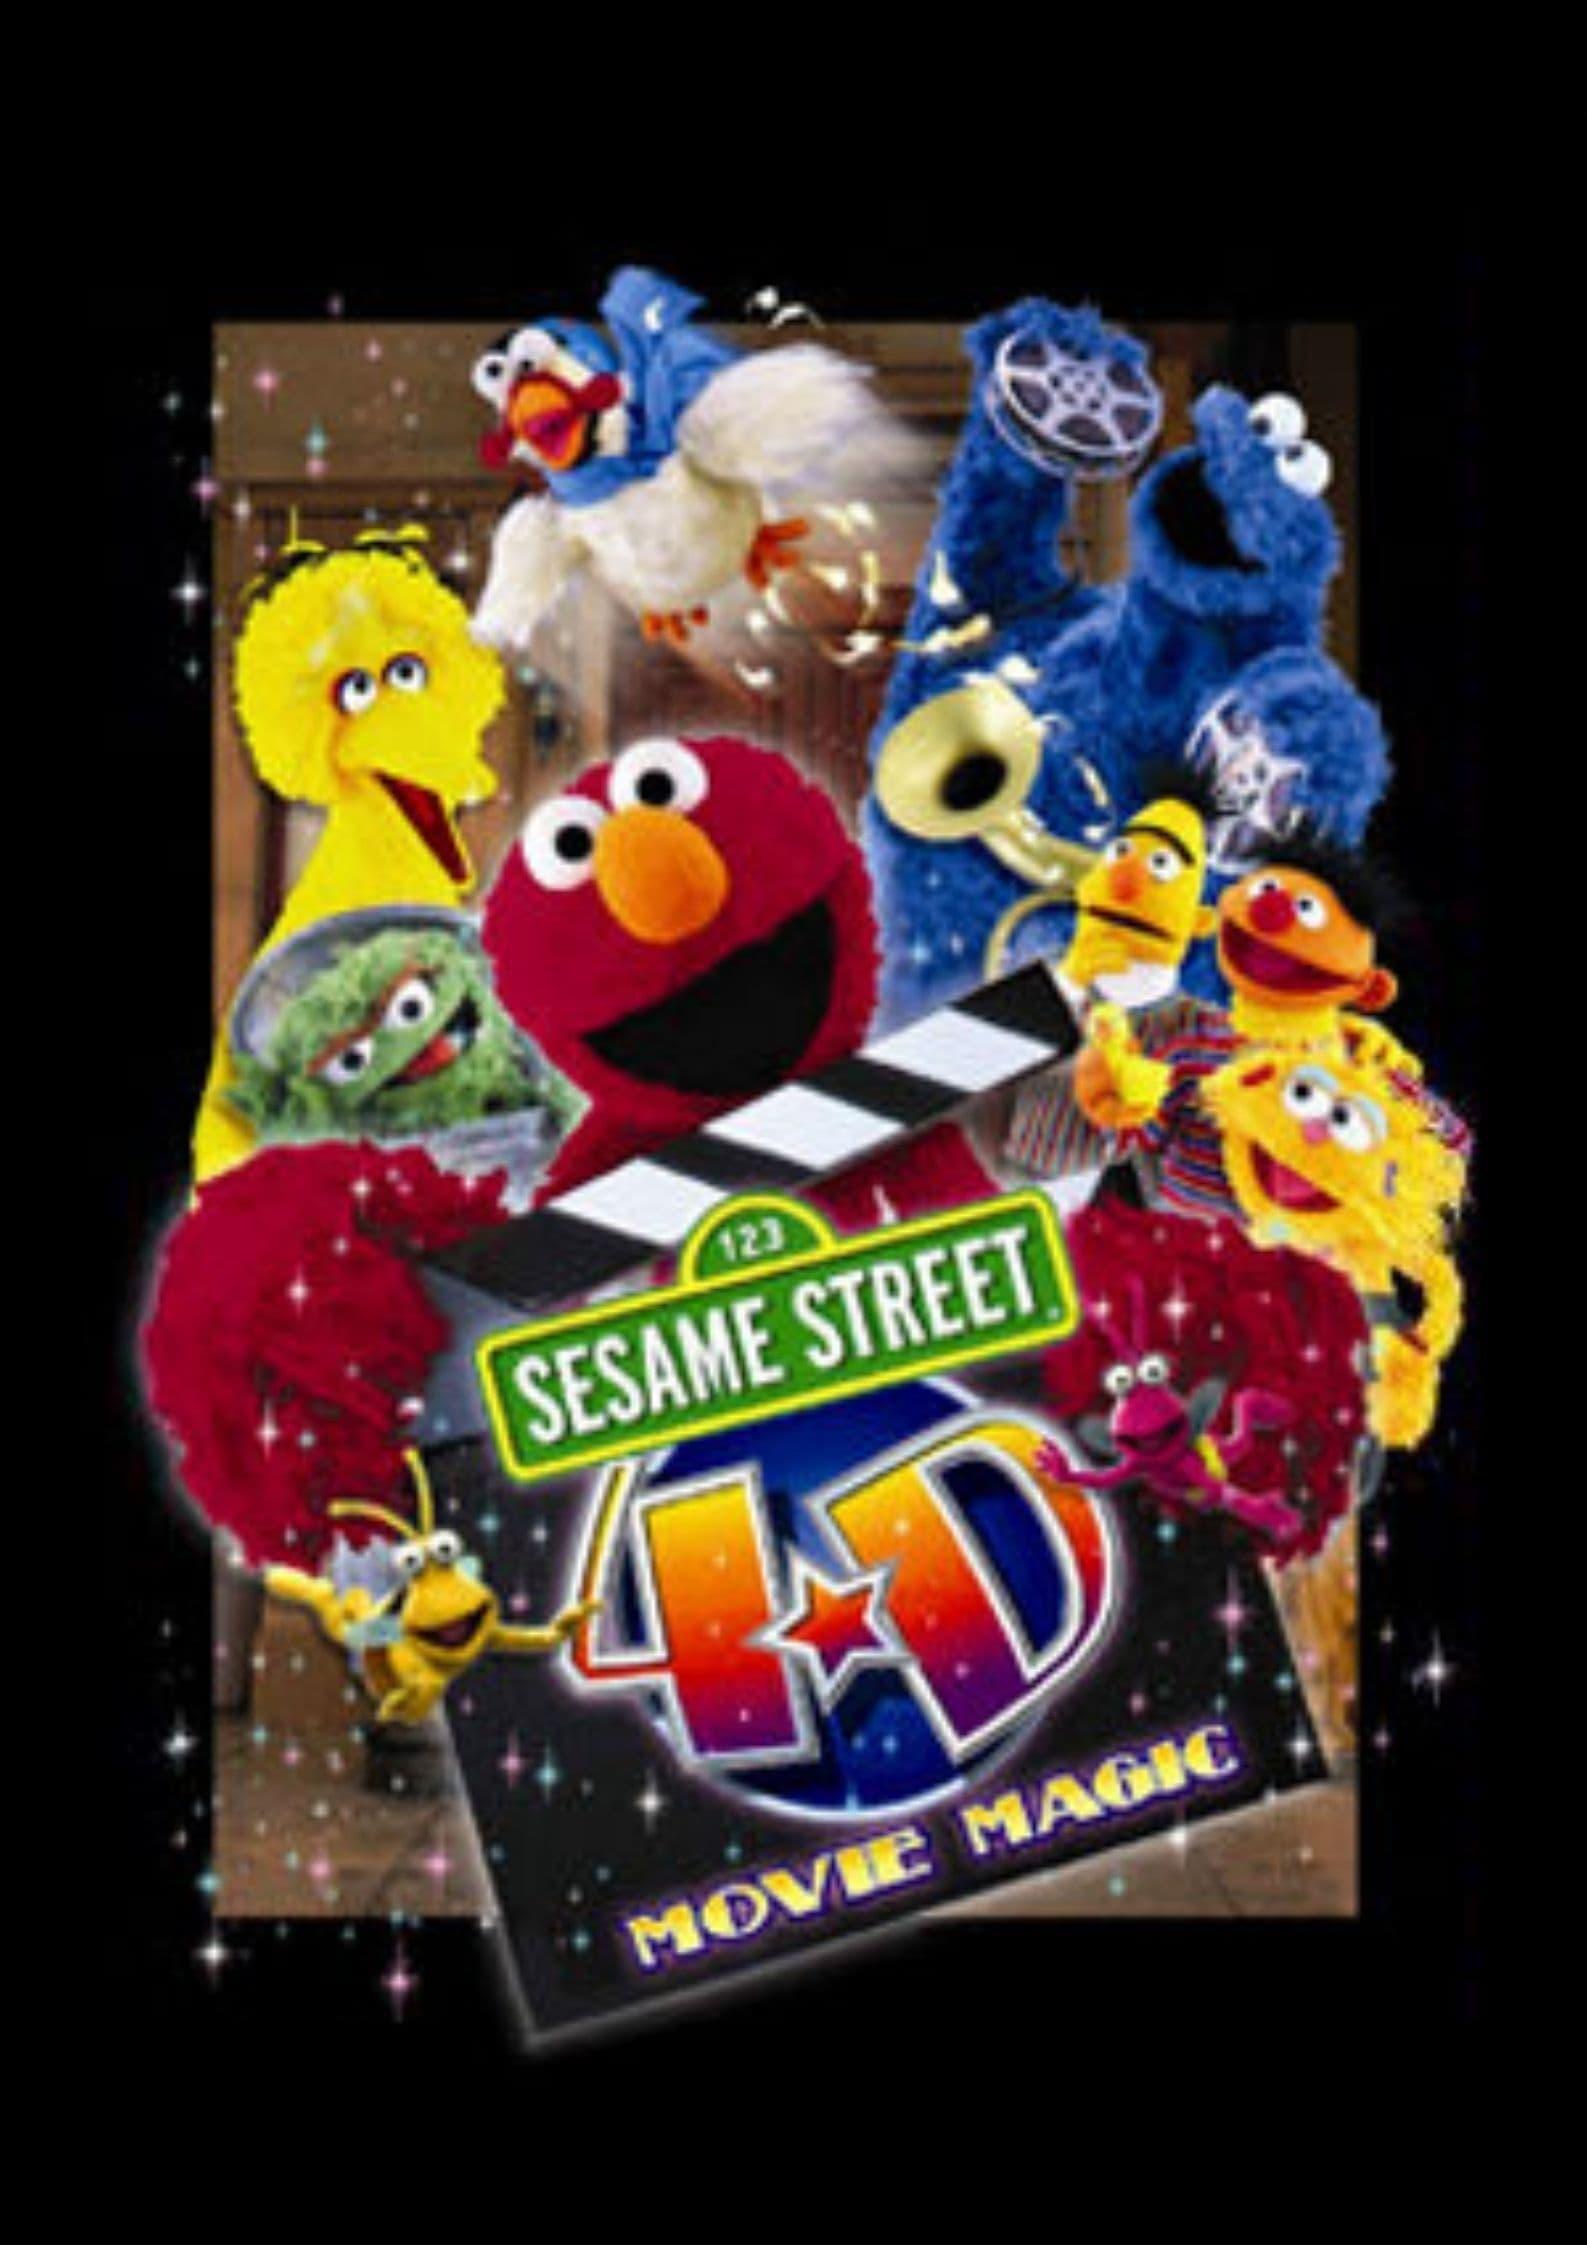 Sesame Street 4-D Movie Magic